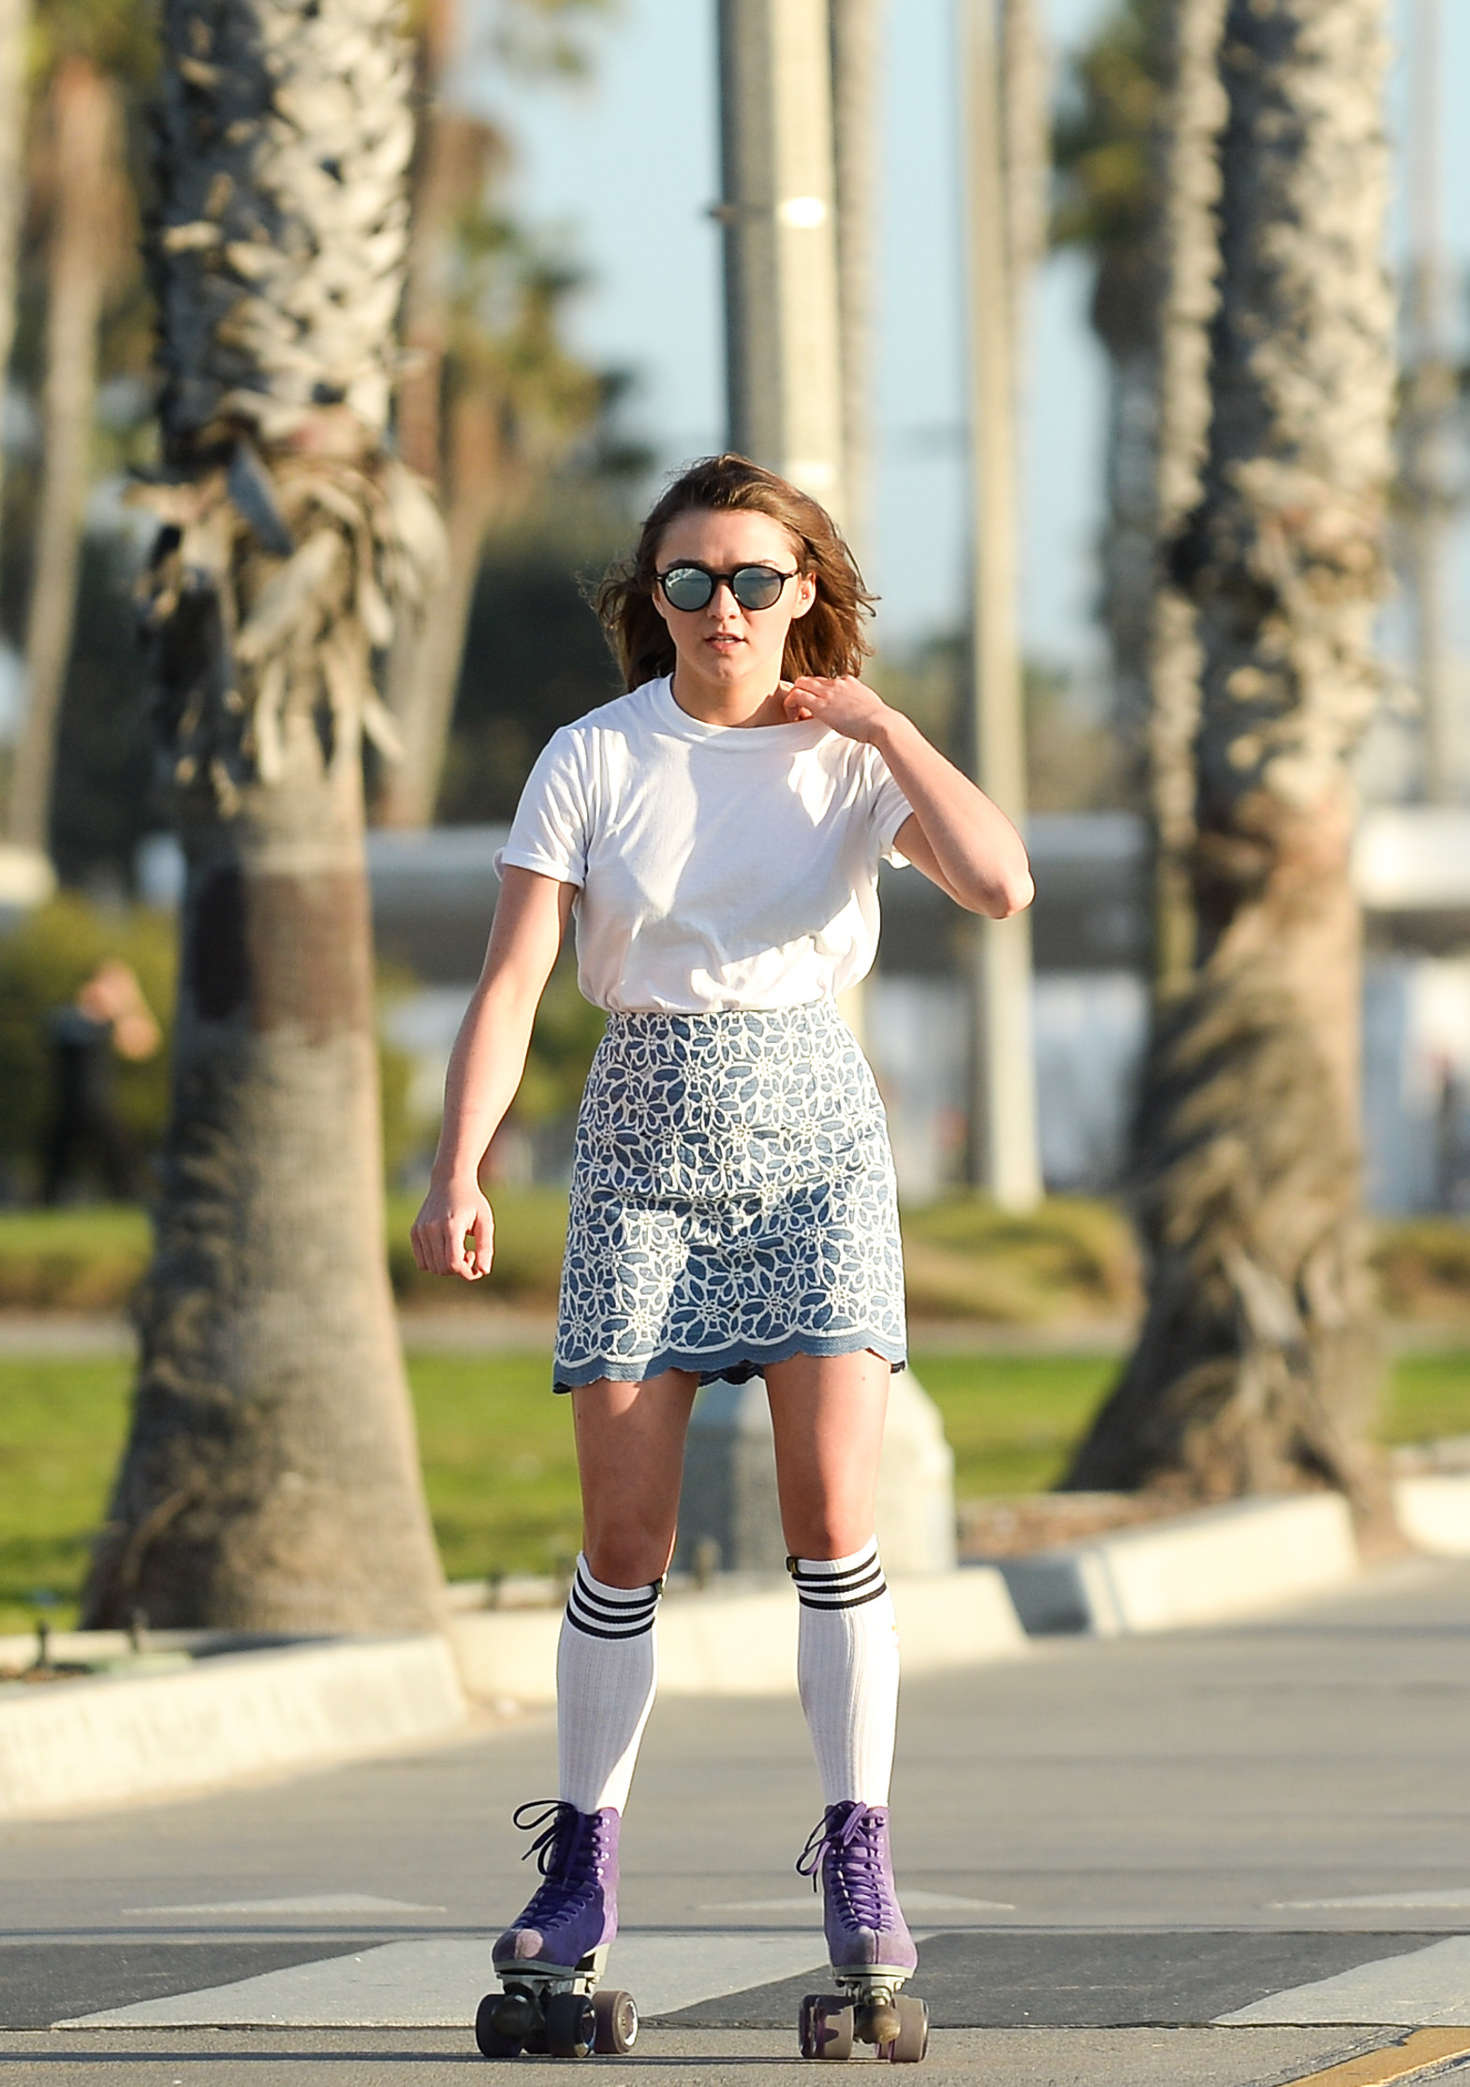 Maisie Williams 2016 : Maisie Williams in Mini Skirt Roller Skating -02